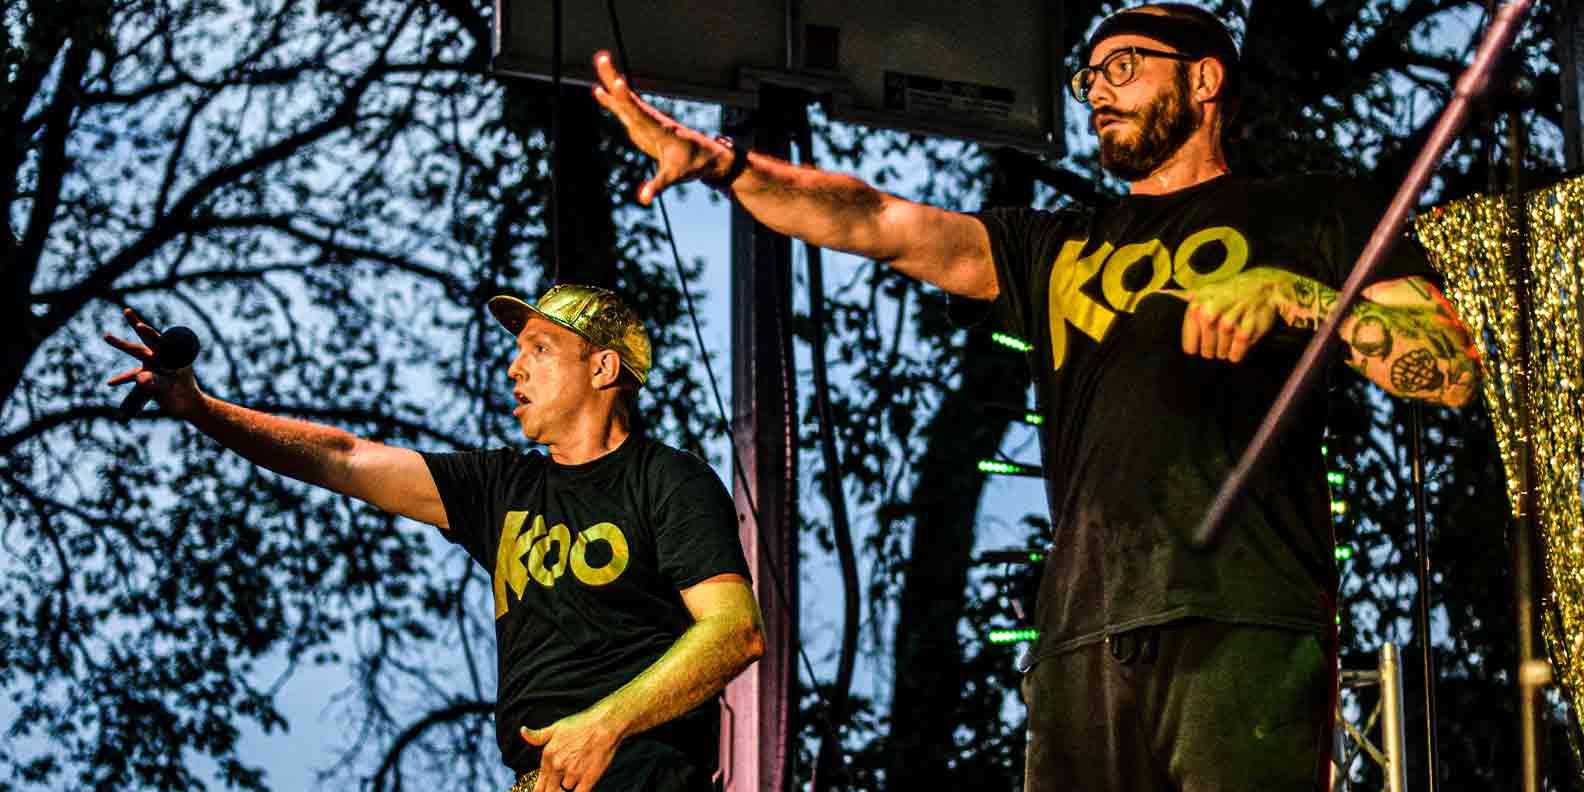 Koo Koo Kangaroo Basilica Block Party Dylan Novacek